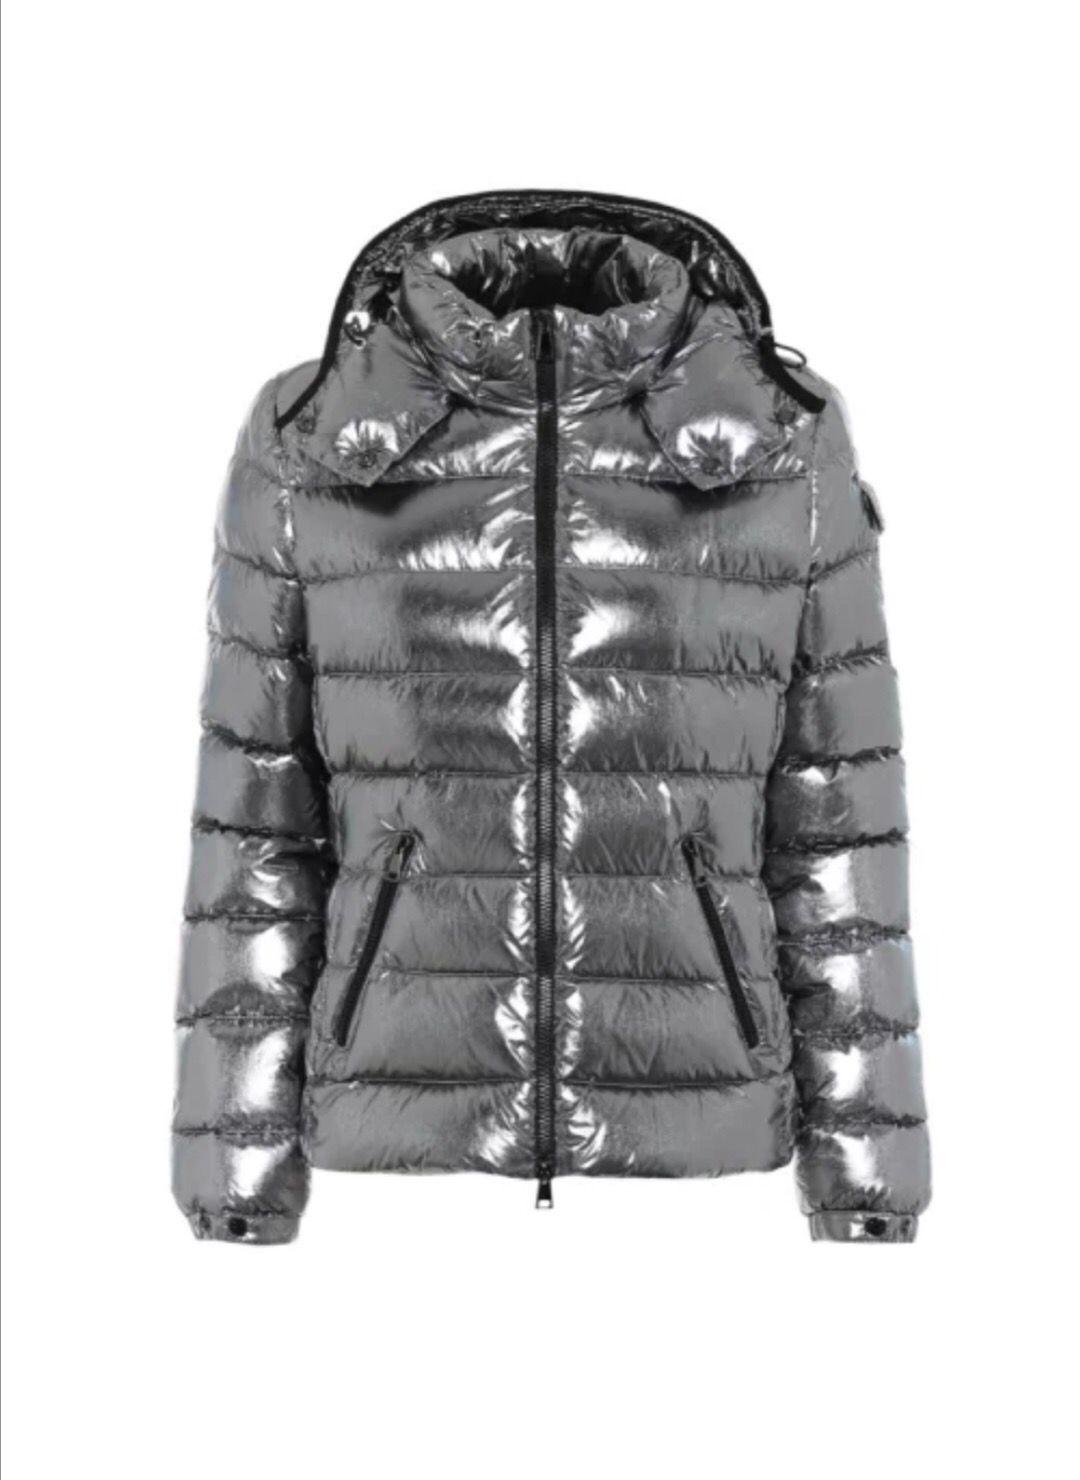 Branded Mulheres Winter Down Jacket Designer Lady Comprimento Brasão Sleeve capuz menina quente Grosso Sliver Outwear